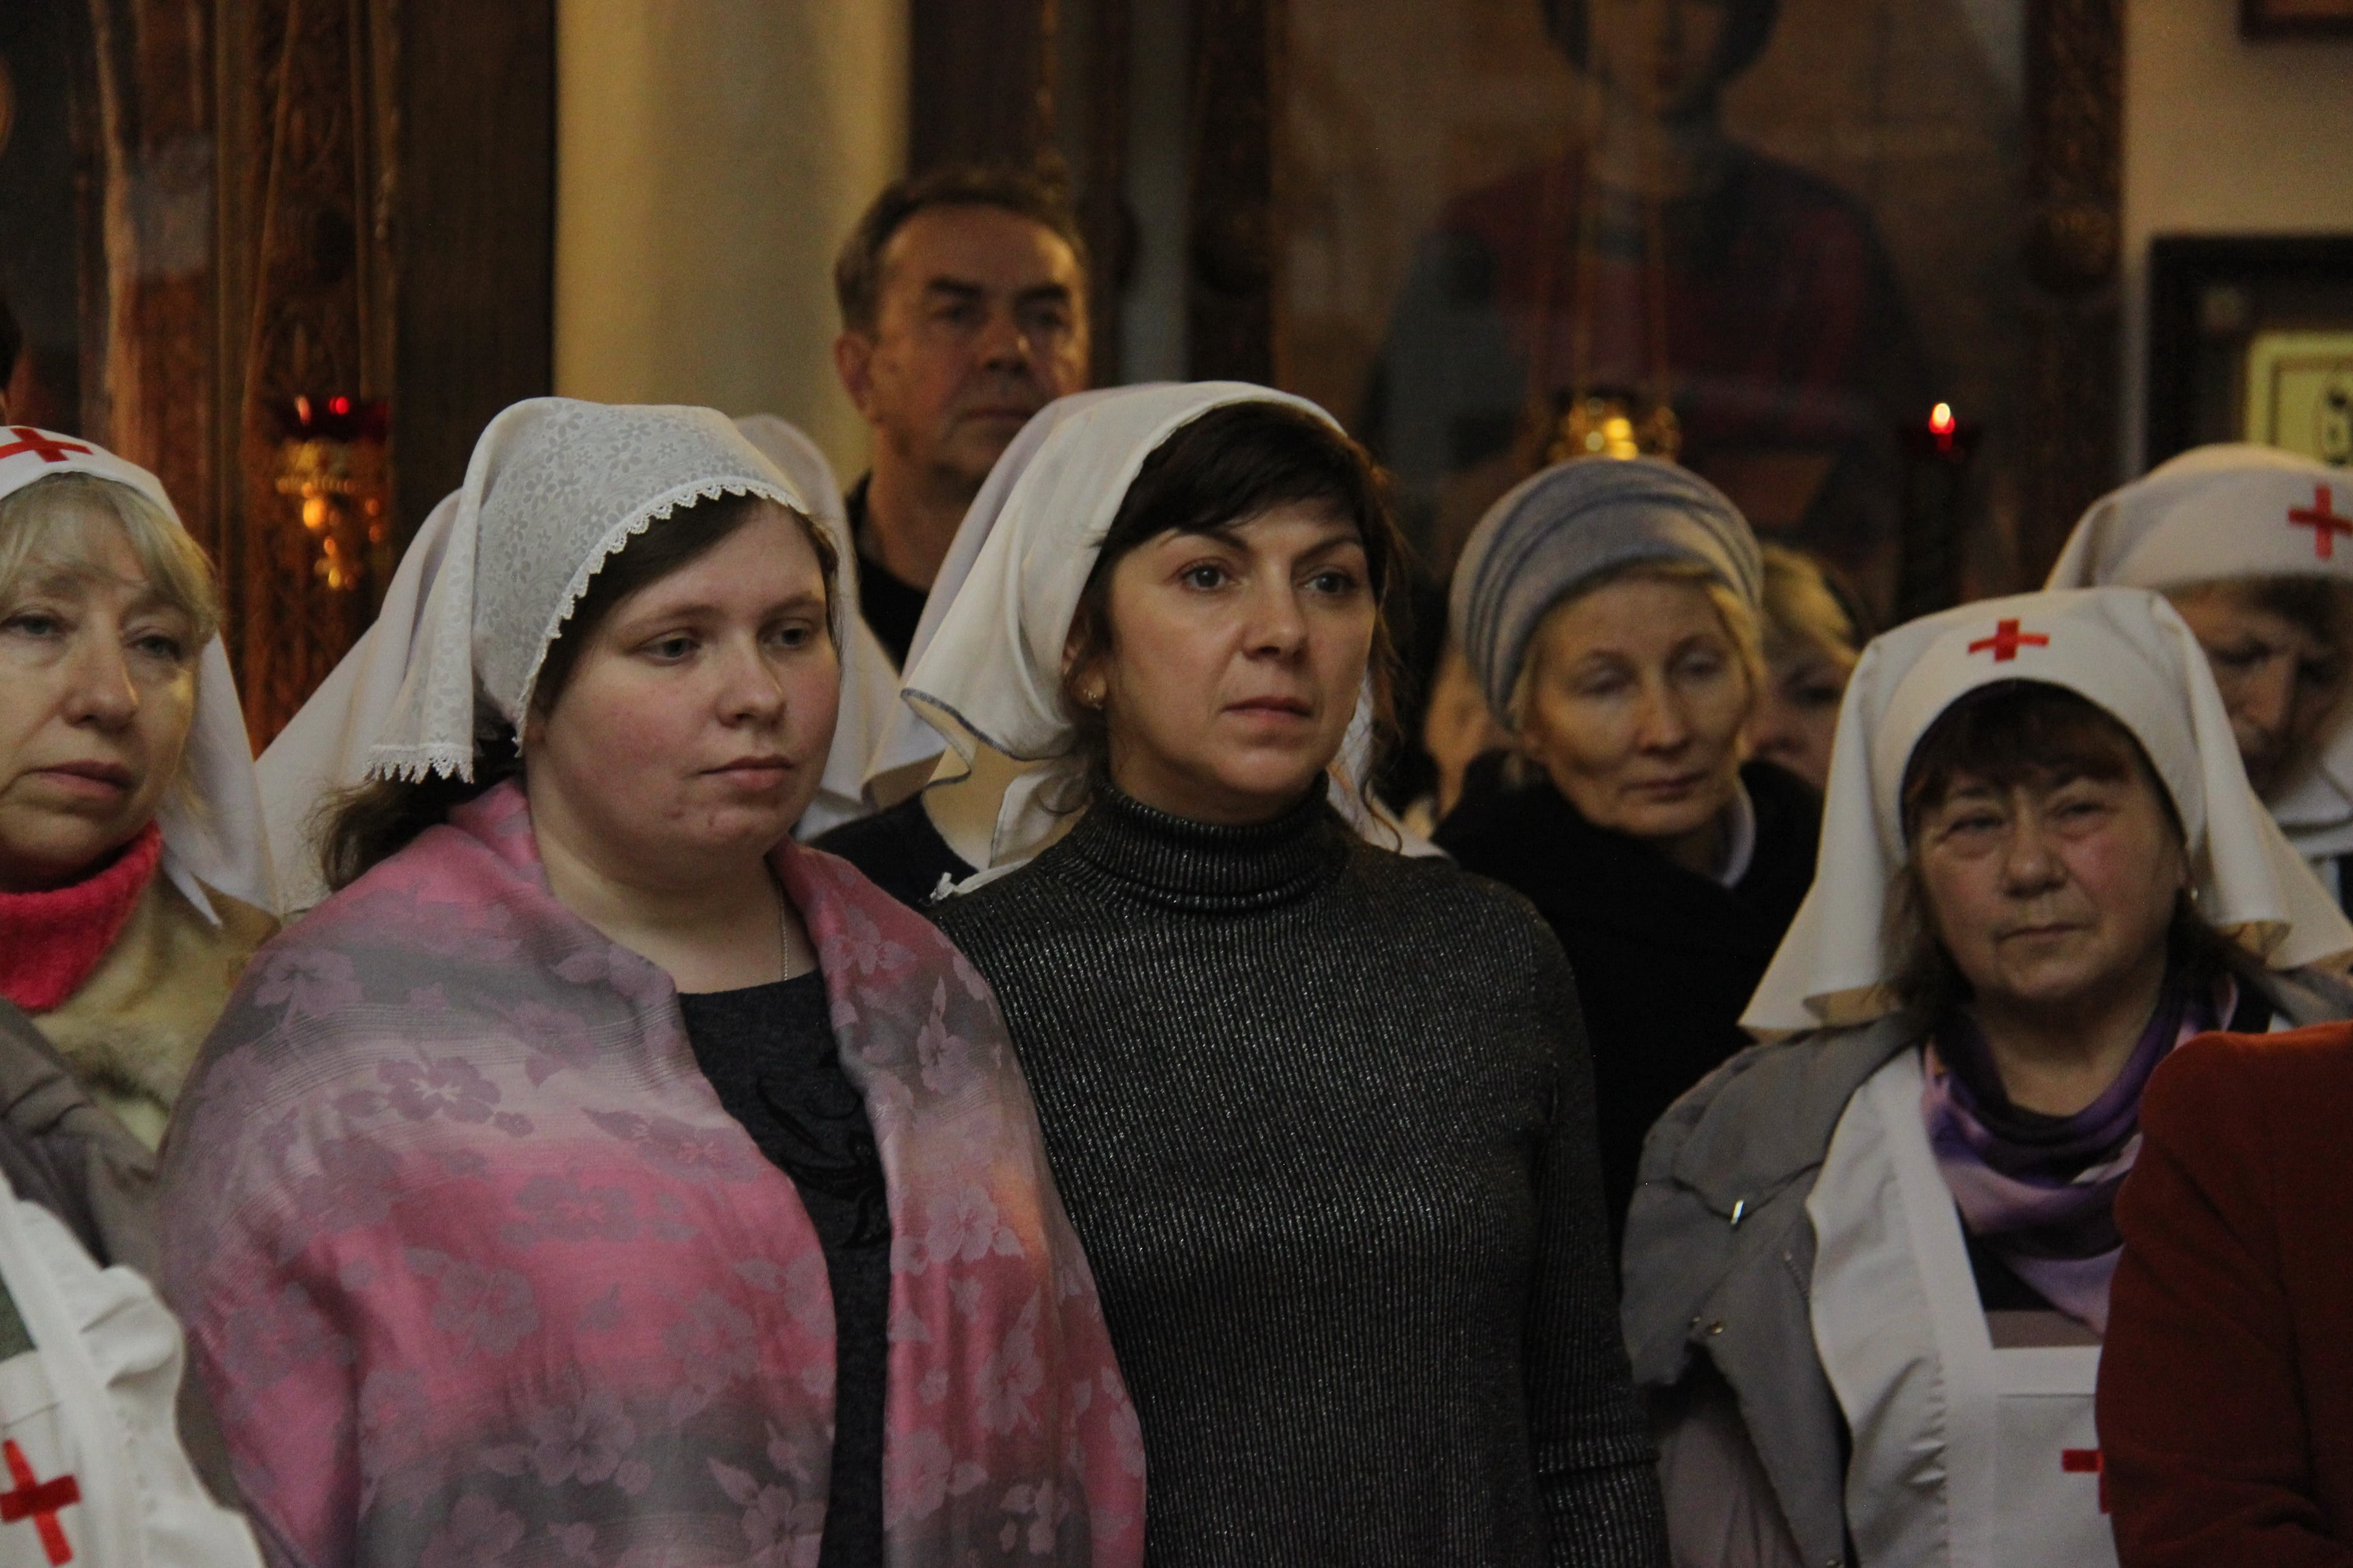 http://monuspen.ru/photoreports/e378941596179341346f1391ec95b2b7.JPG